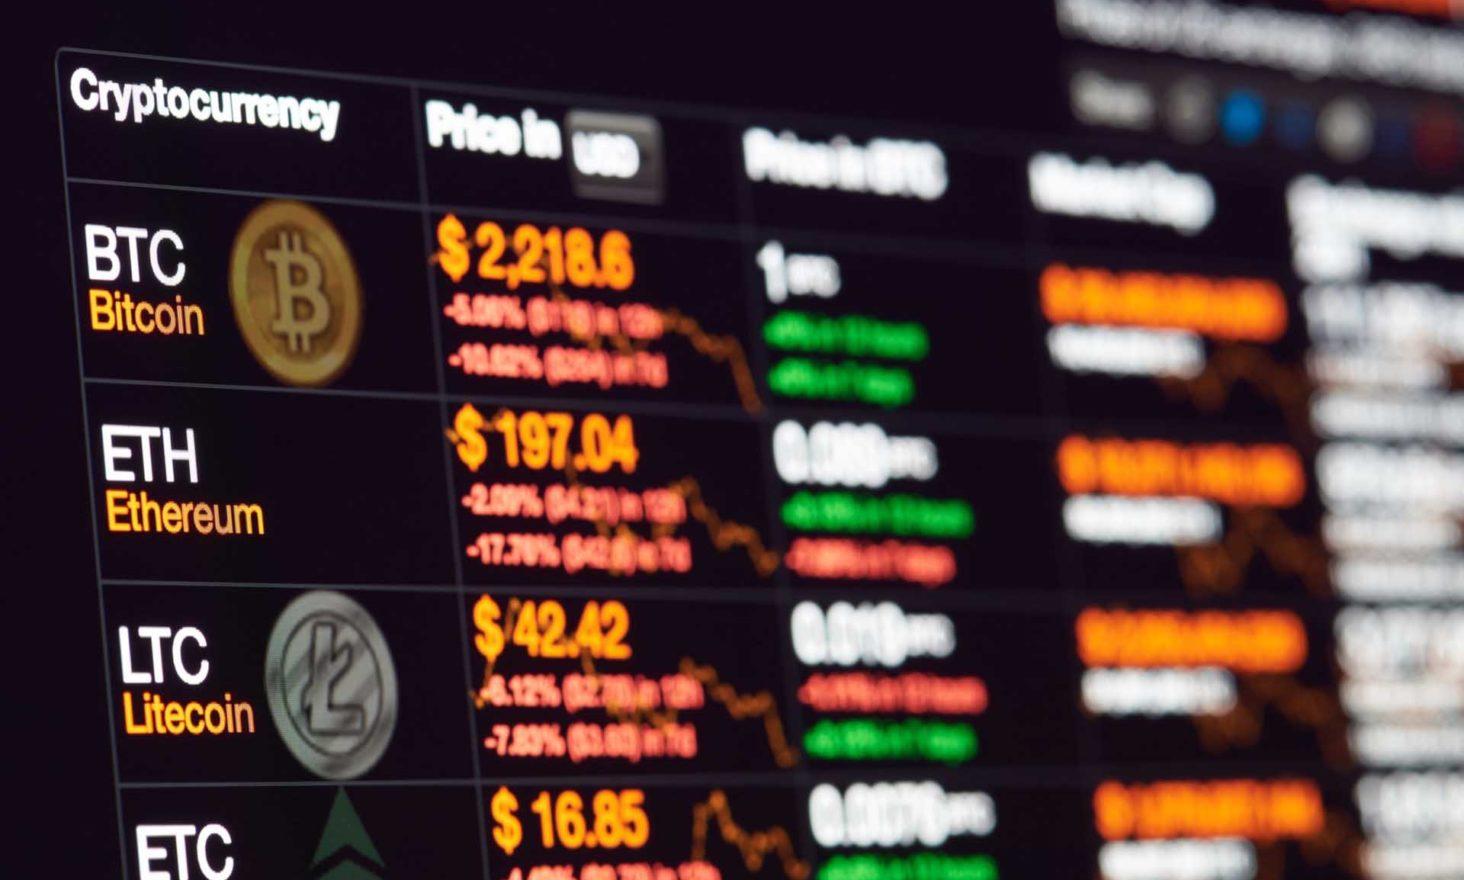 'Hype' vs 'Value' Coins